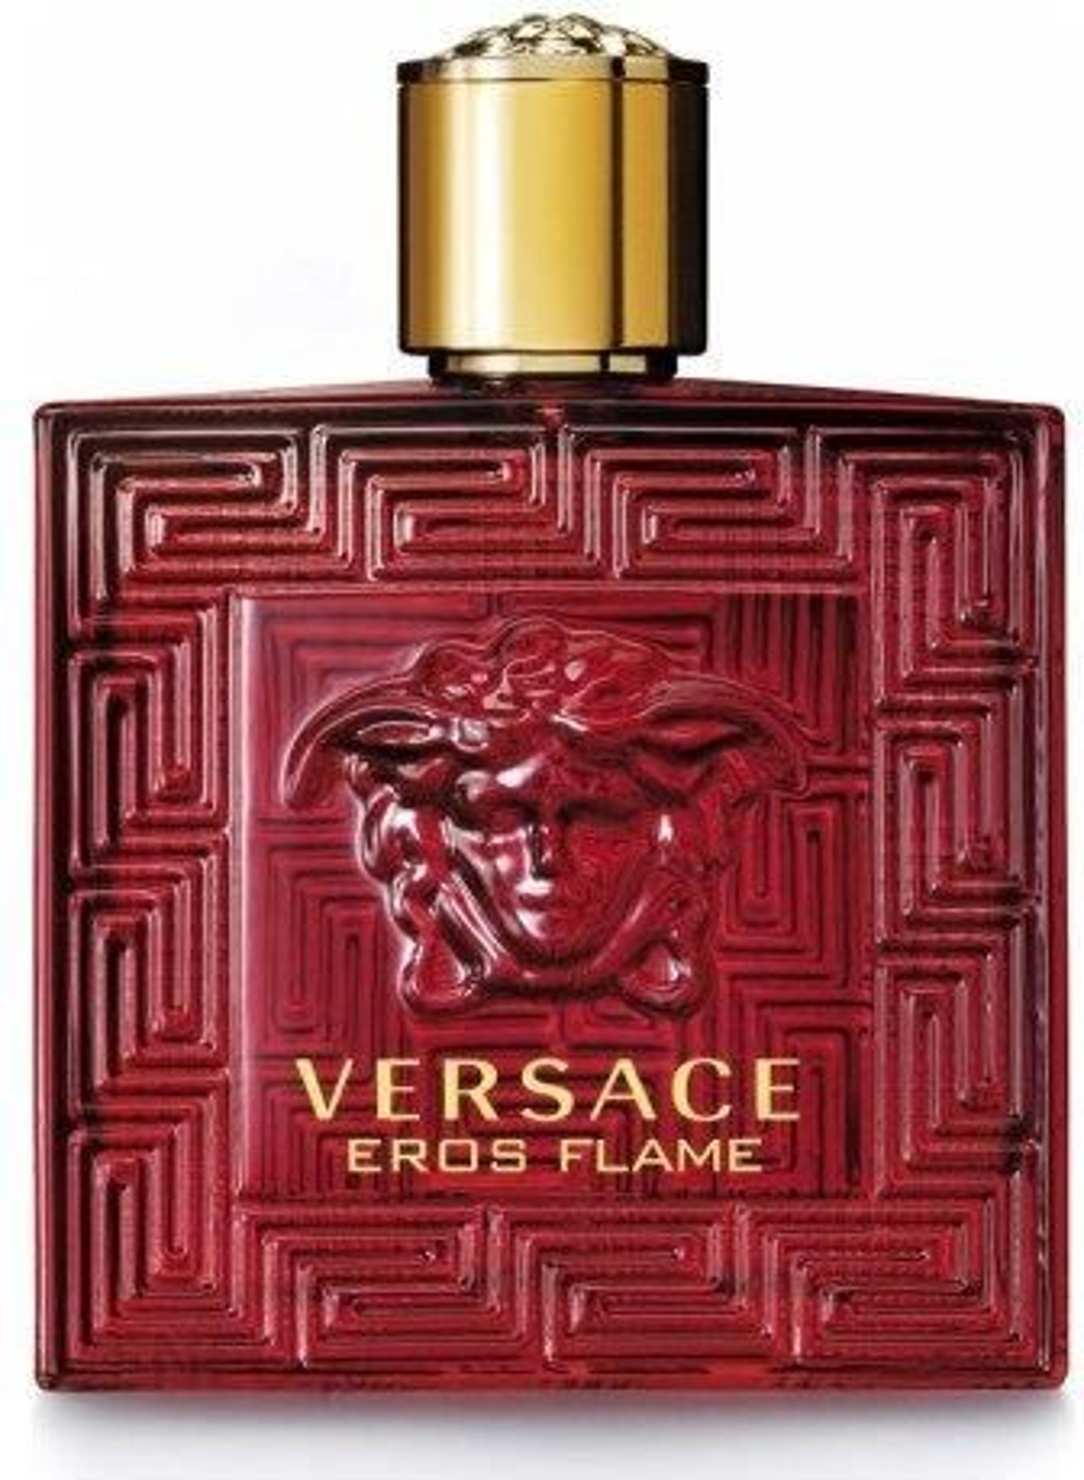 Versace Eros Flame Woda Perfumowana 100ml